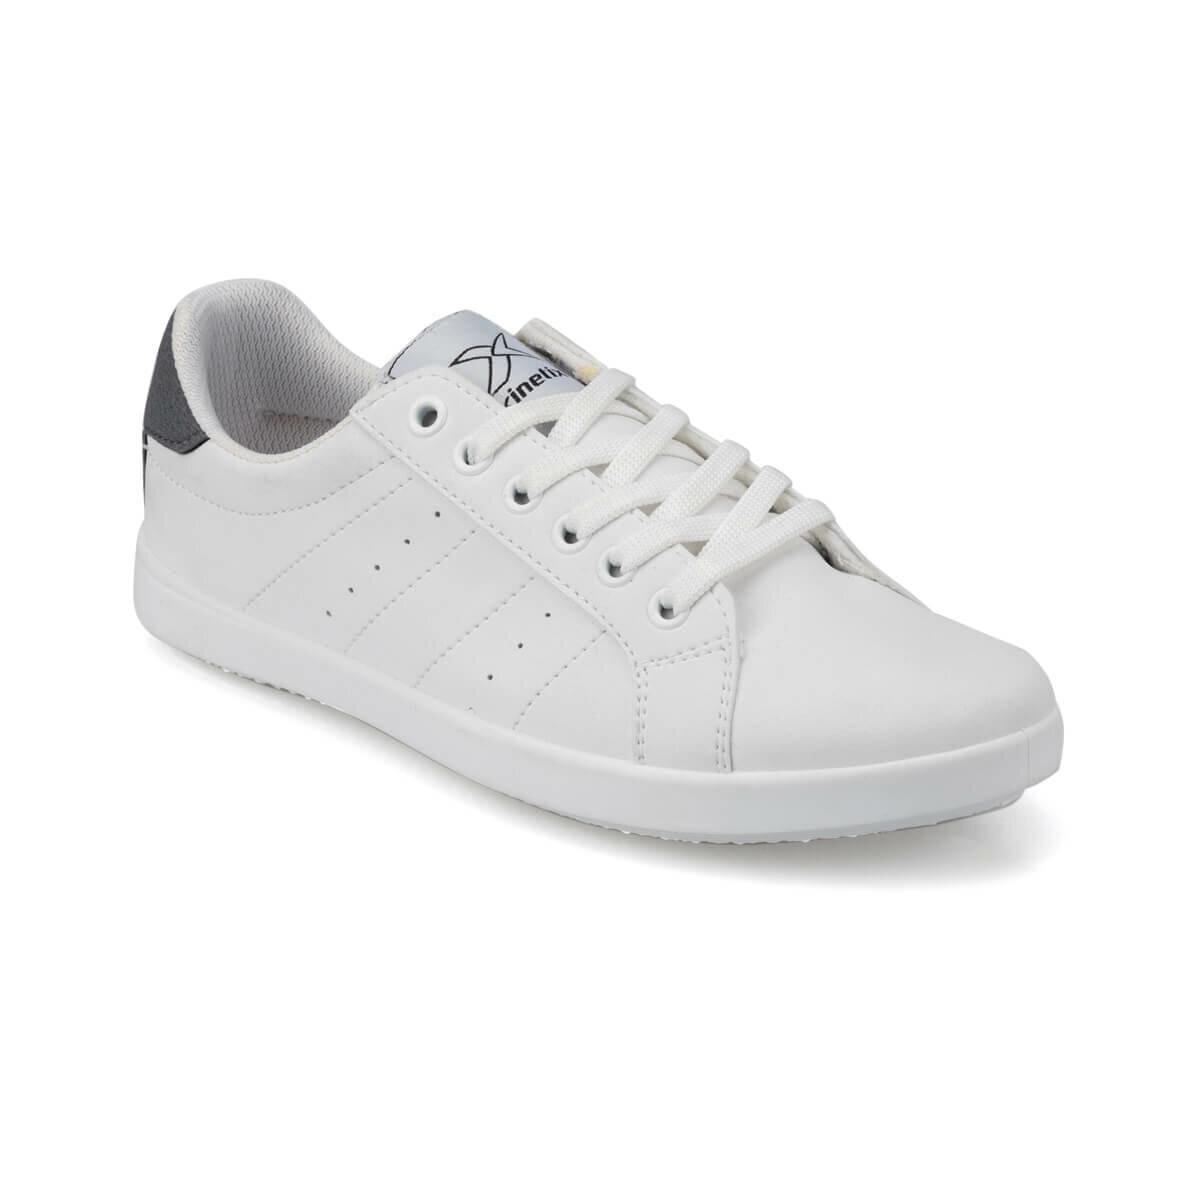 FLO GERRY 9PR White Women 'S Sneaker Shoes KINETIX